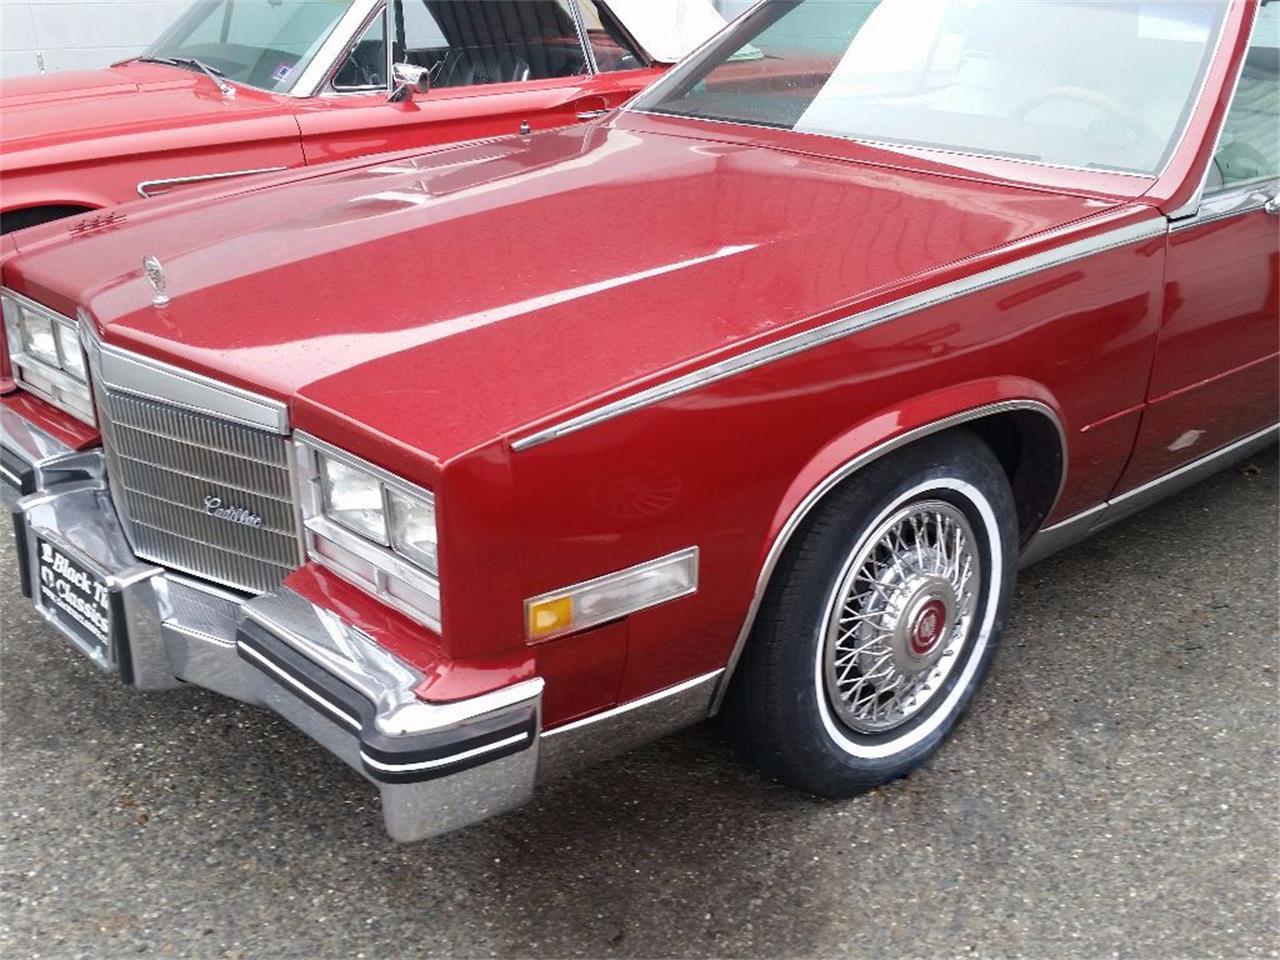 1985 Cadillac Eldorado (CC-1375137) for sale in Stratford, New Jersey